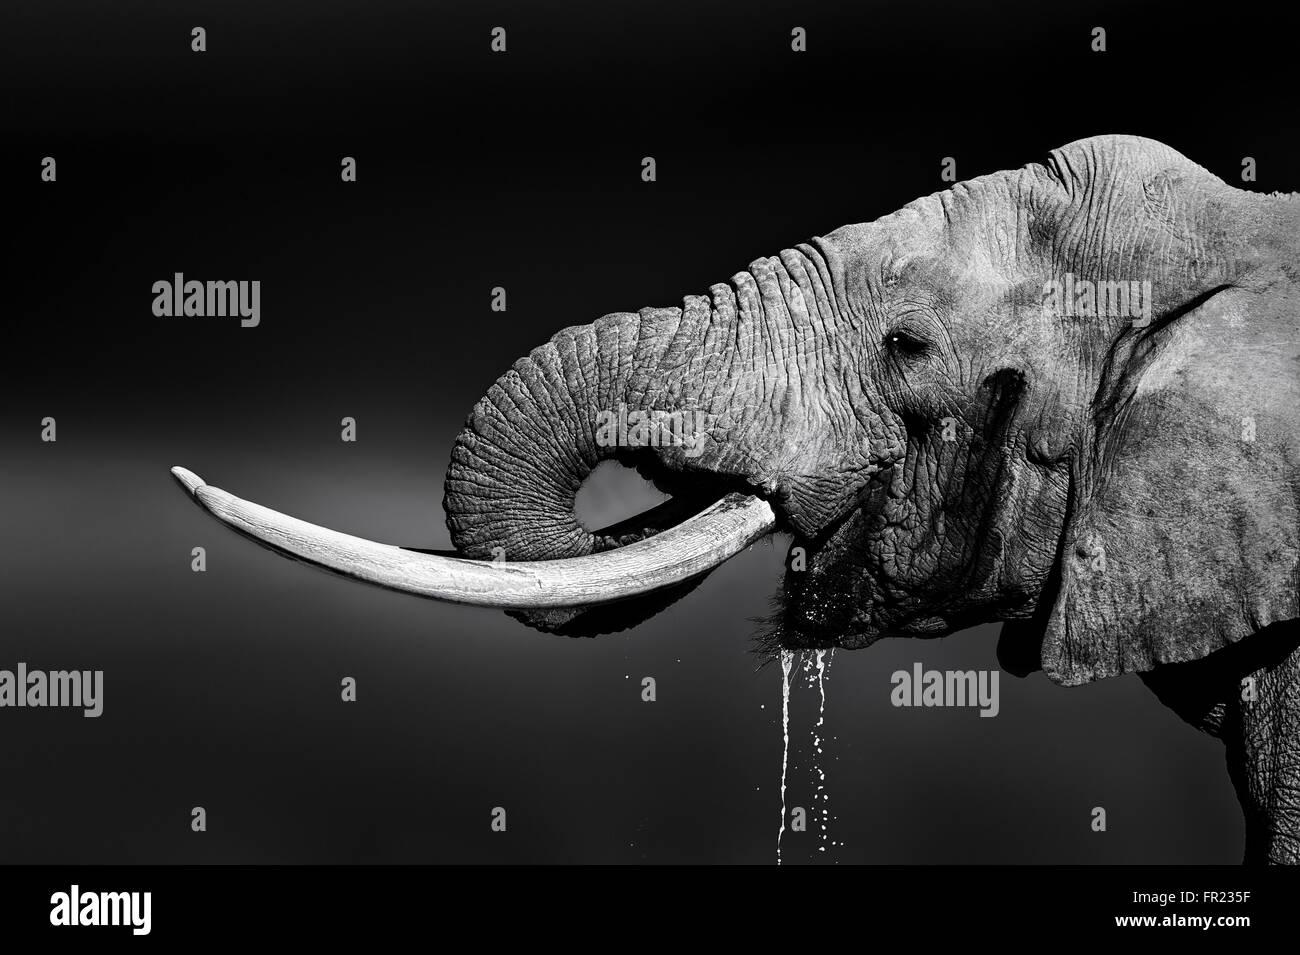 Bull con grandes colmillos de elefante de agua potable. Close-up retrato con vista lateral en Parque Nacional Addo Imagen De Stock